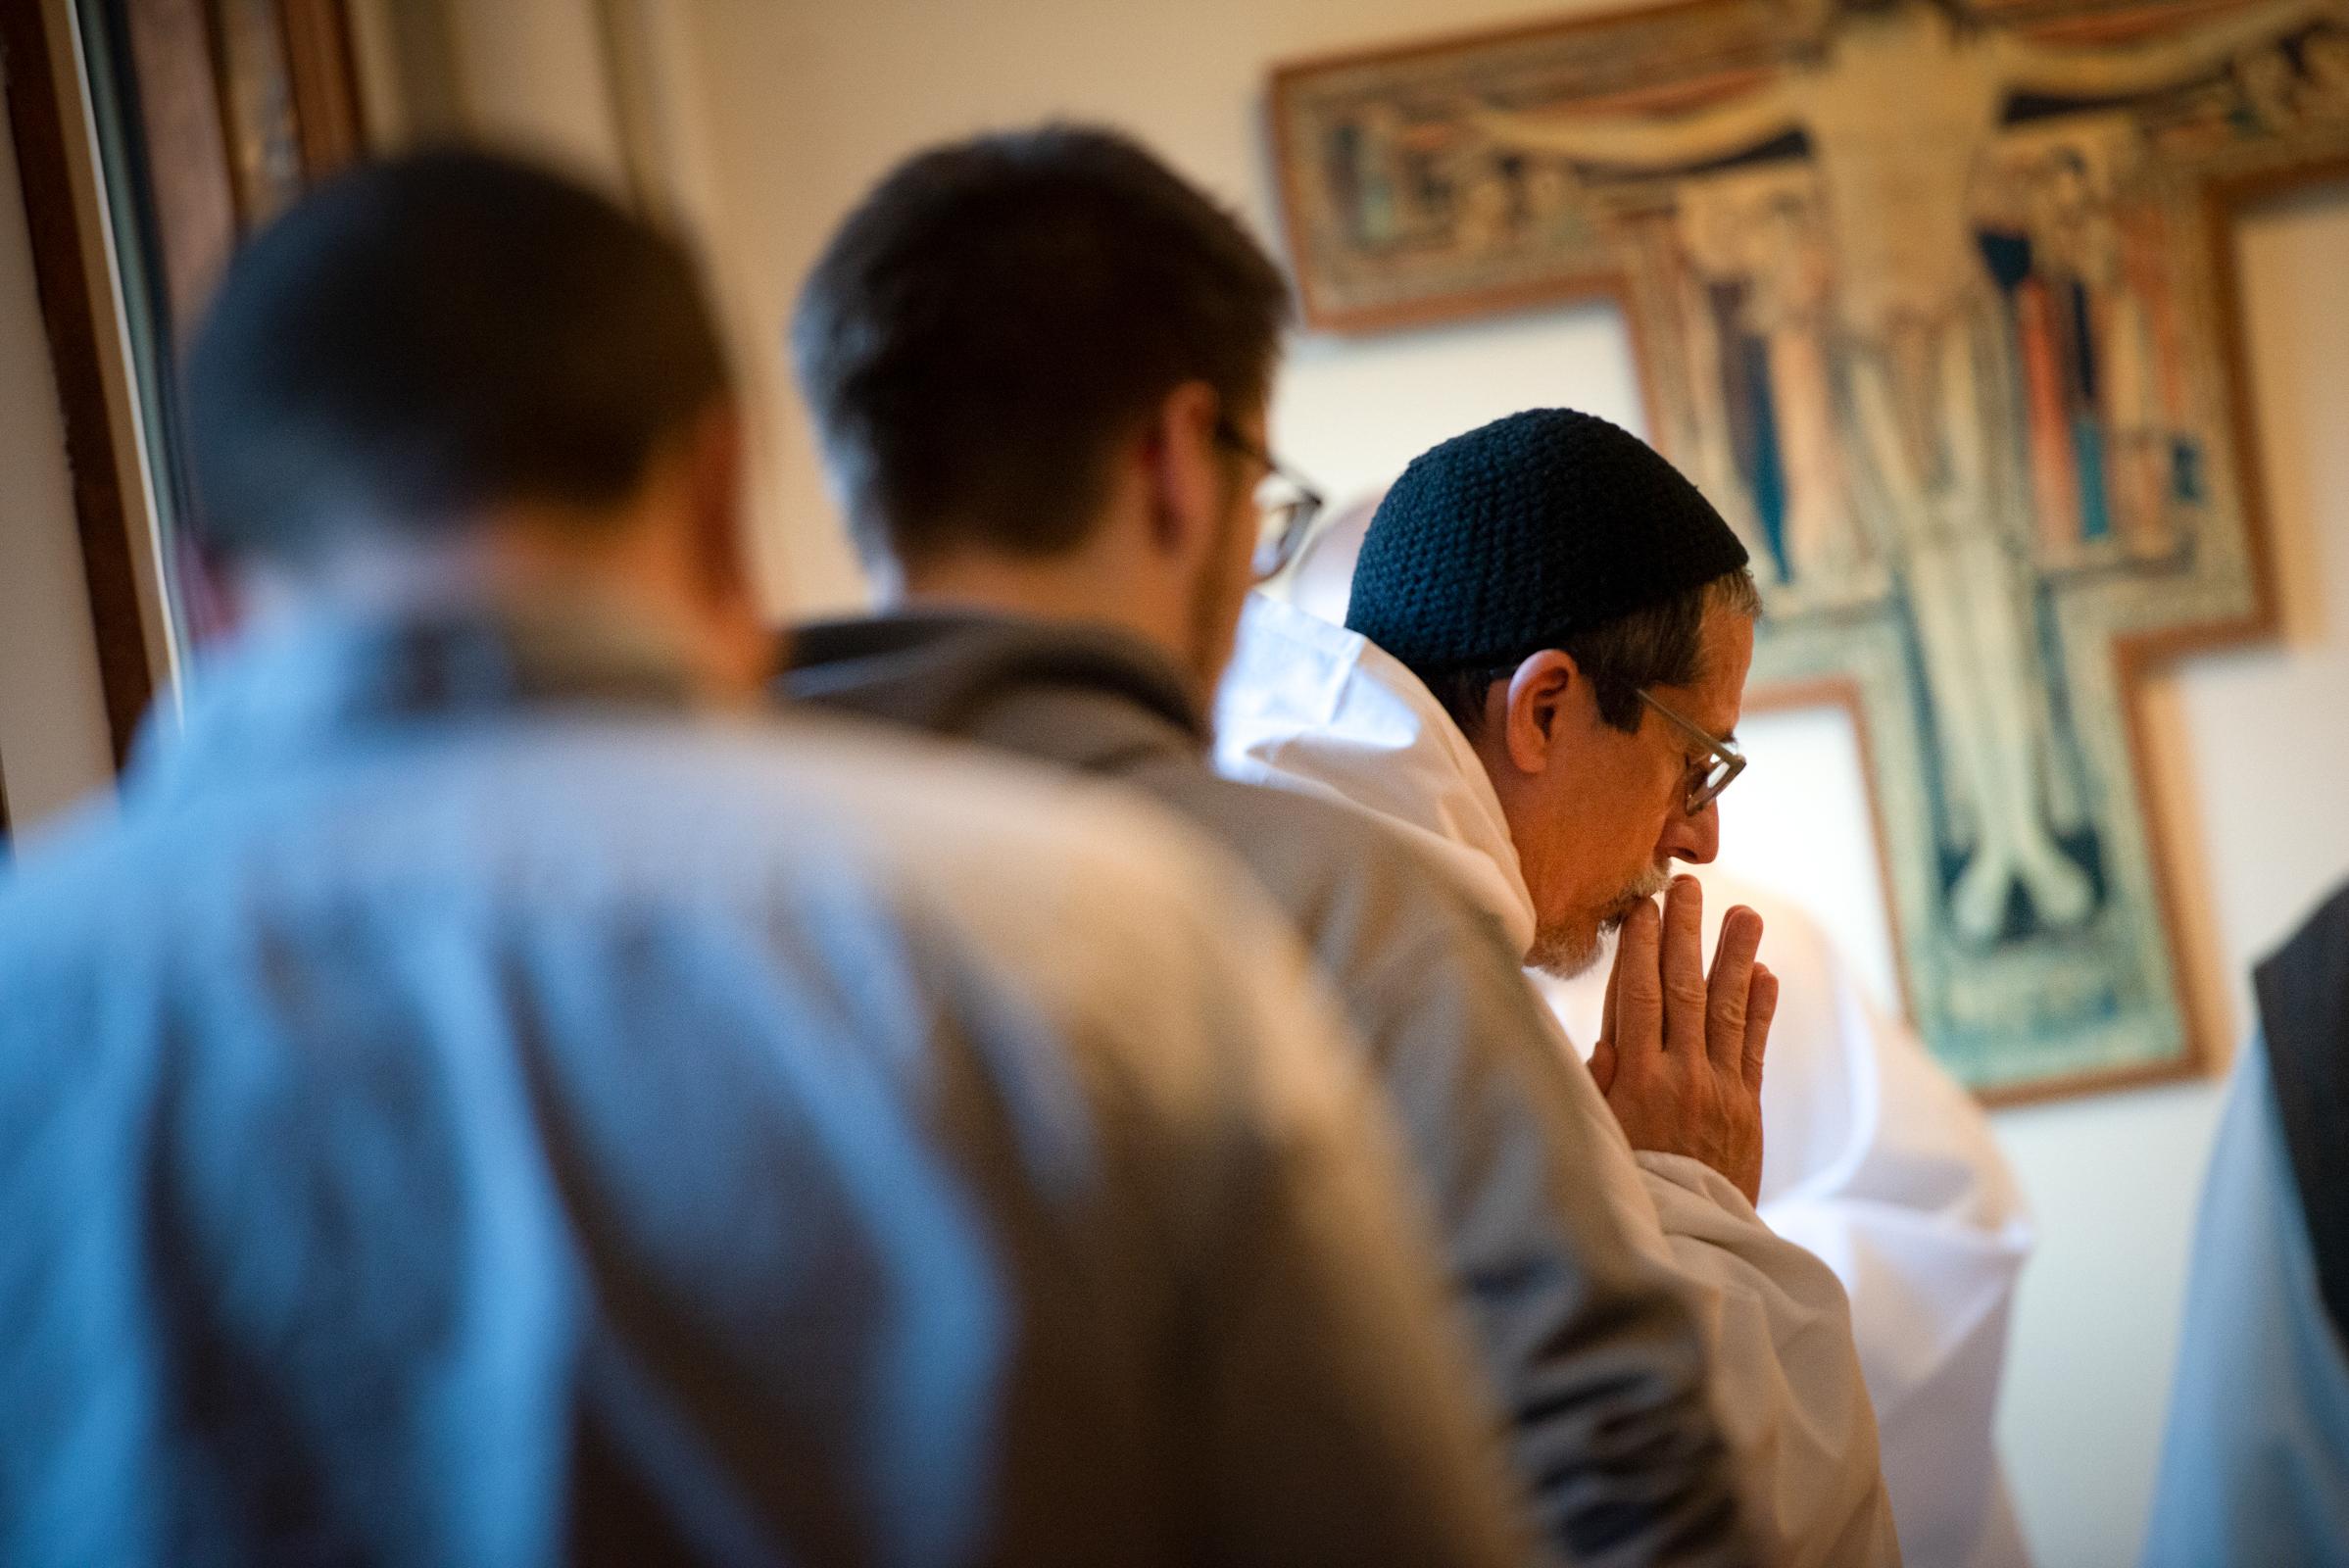 FRANCISCAN FRIARS OF THE RENEWAL,CATHOLIC